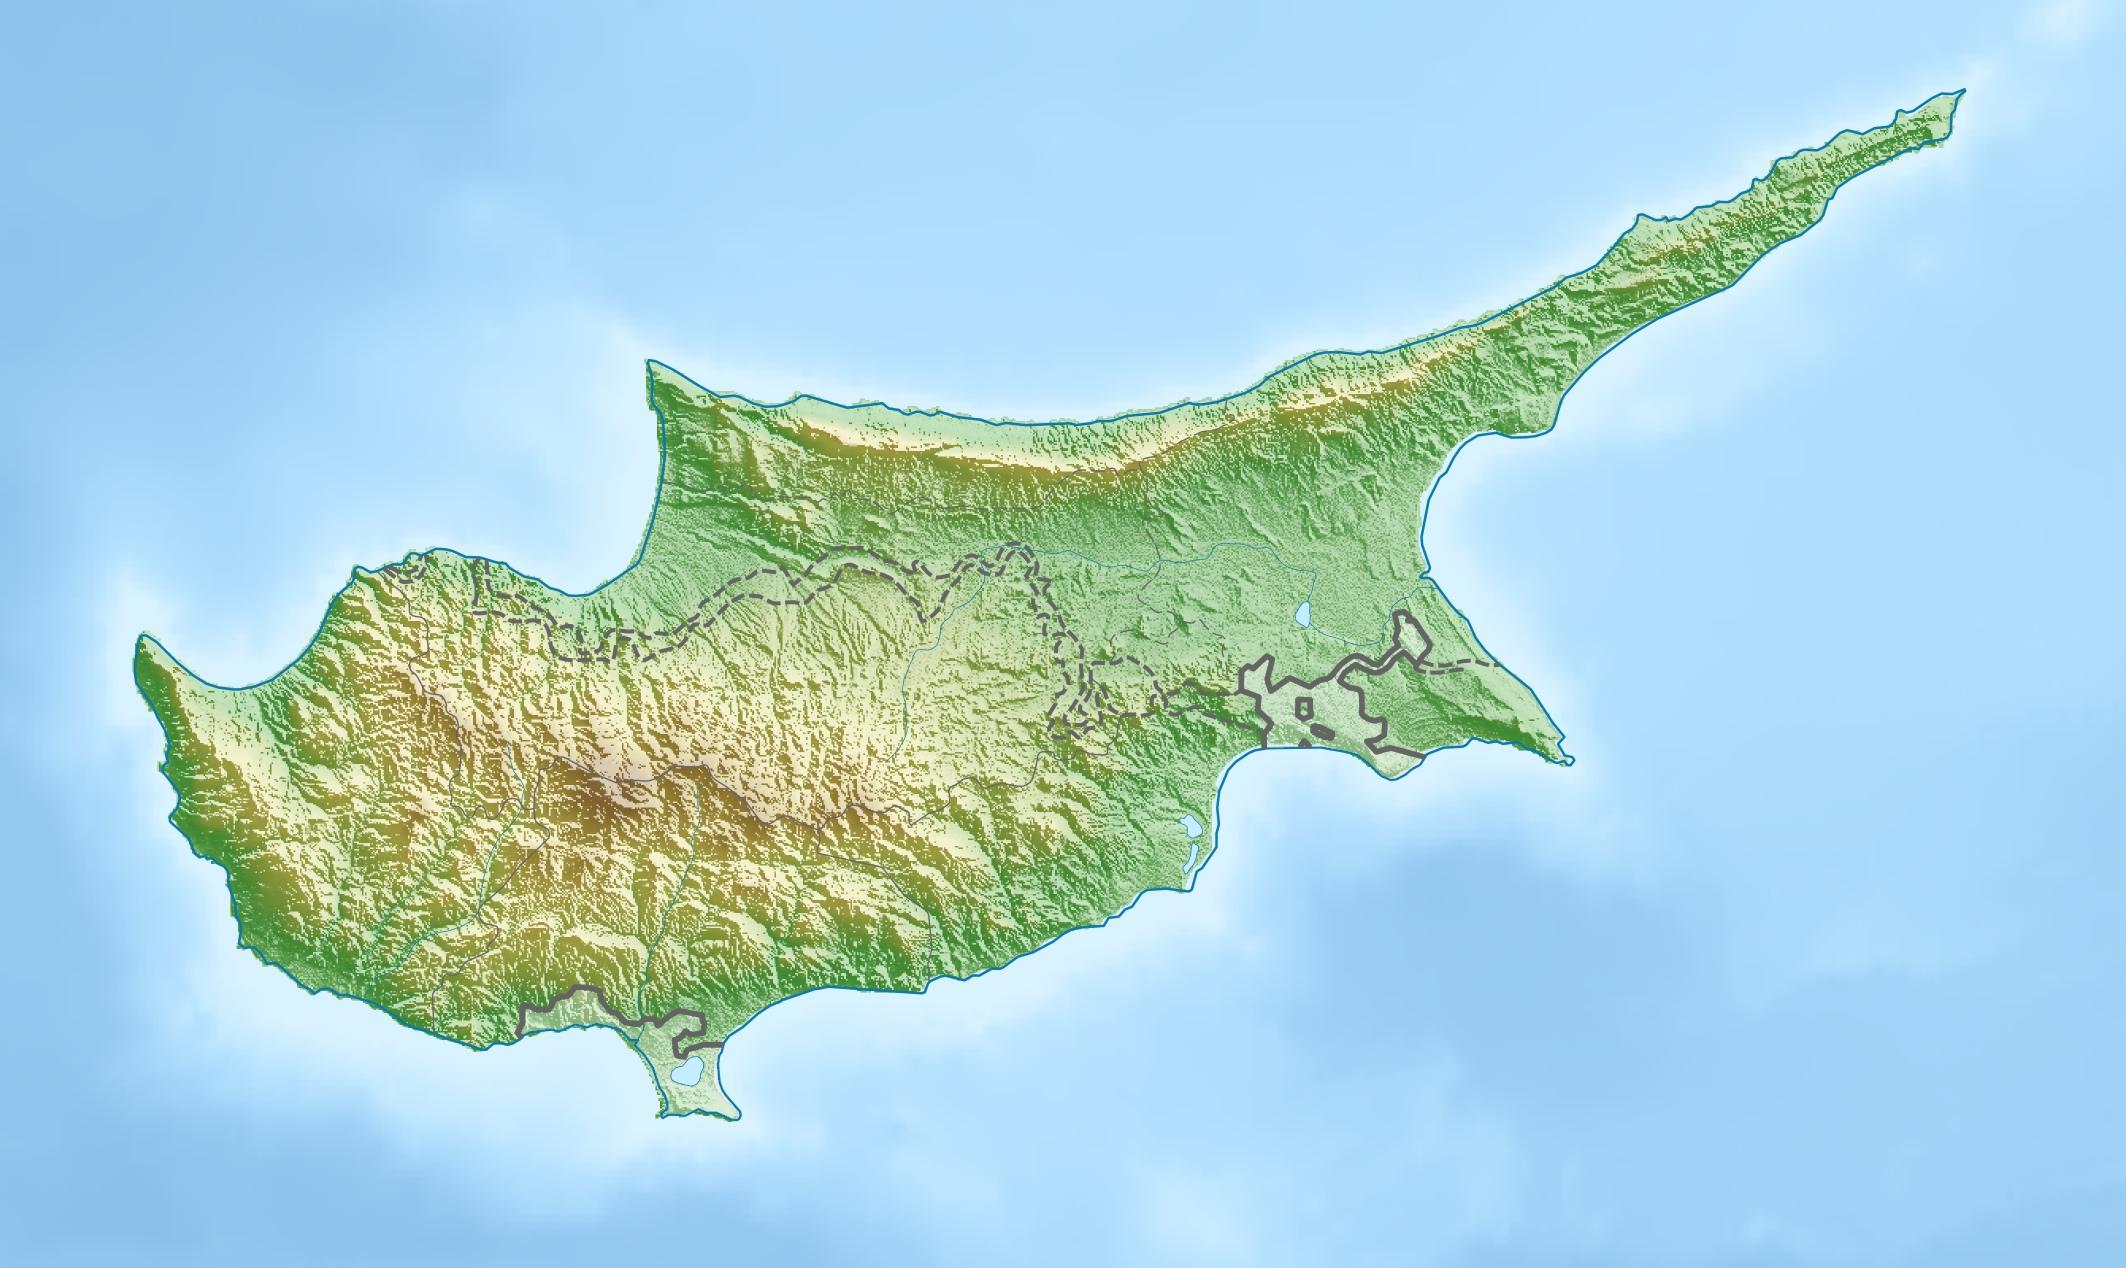 Carte De Resident Chypre.Astromeritis Wikipedia